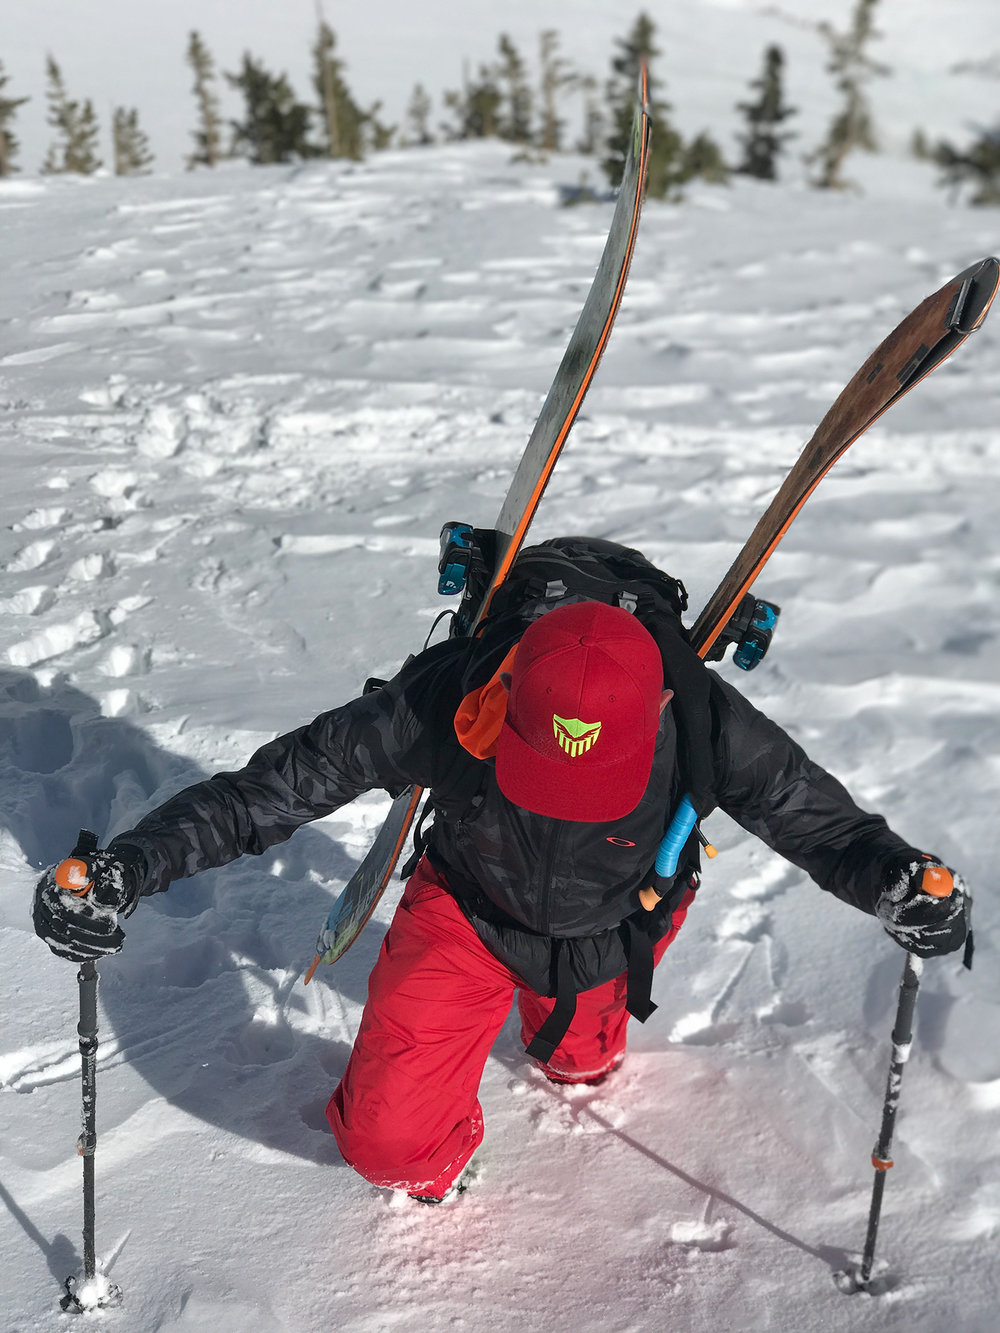 burke-alder-ski-booting-primrose-cirque-picture.jpg